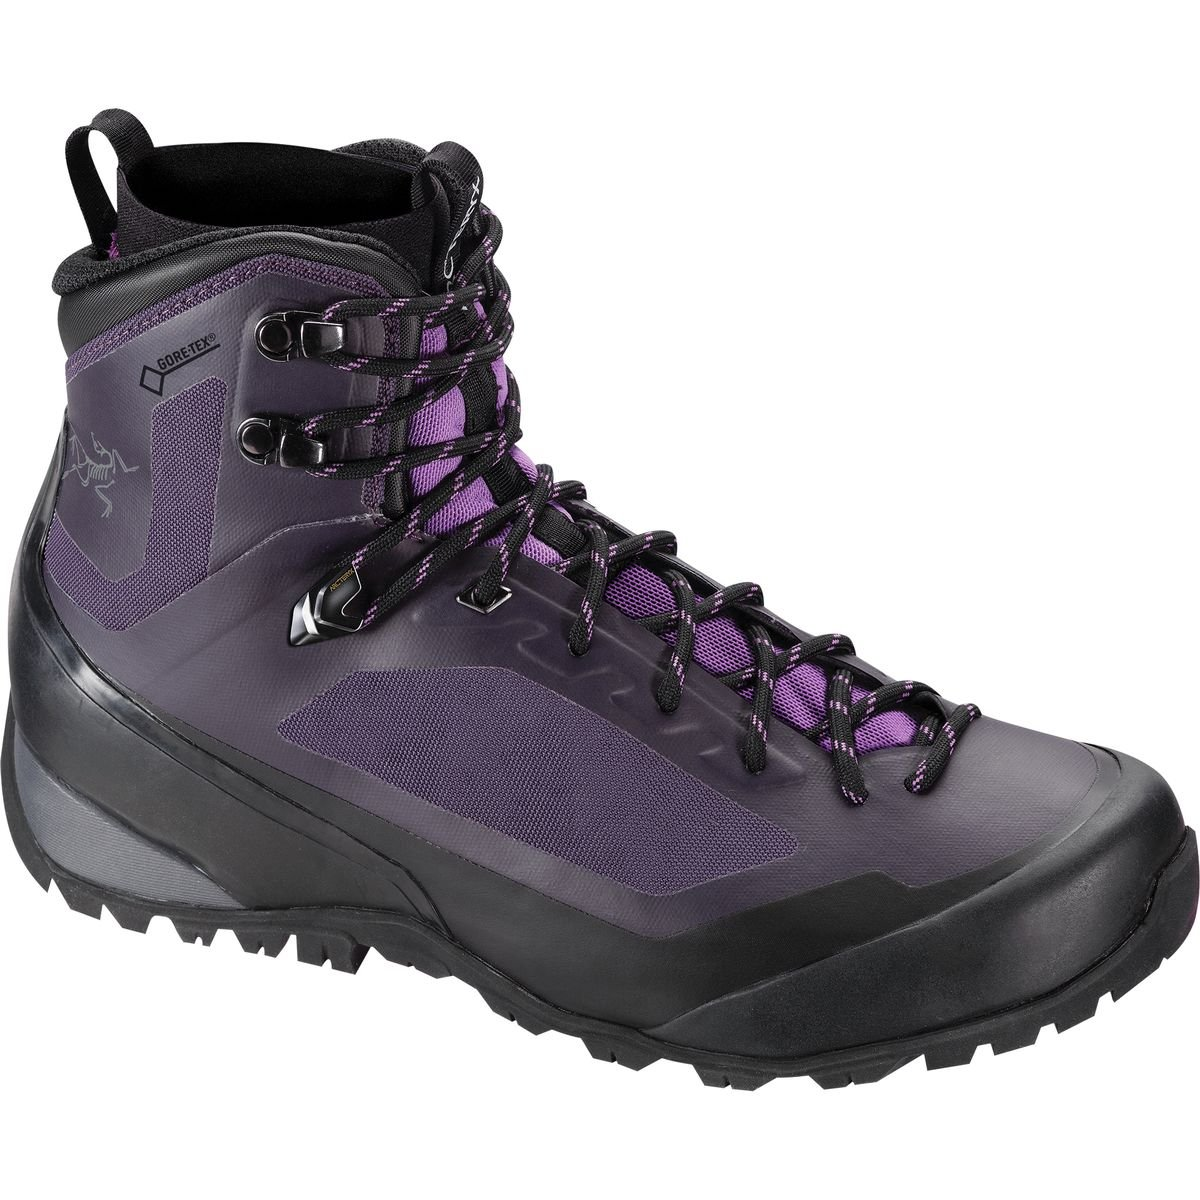 Arcteryx Bora Mid GTX Hiking Boot - Women's Black / Mid Seaspray 8 US